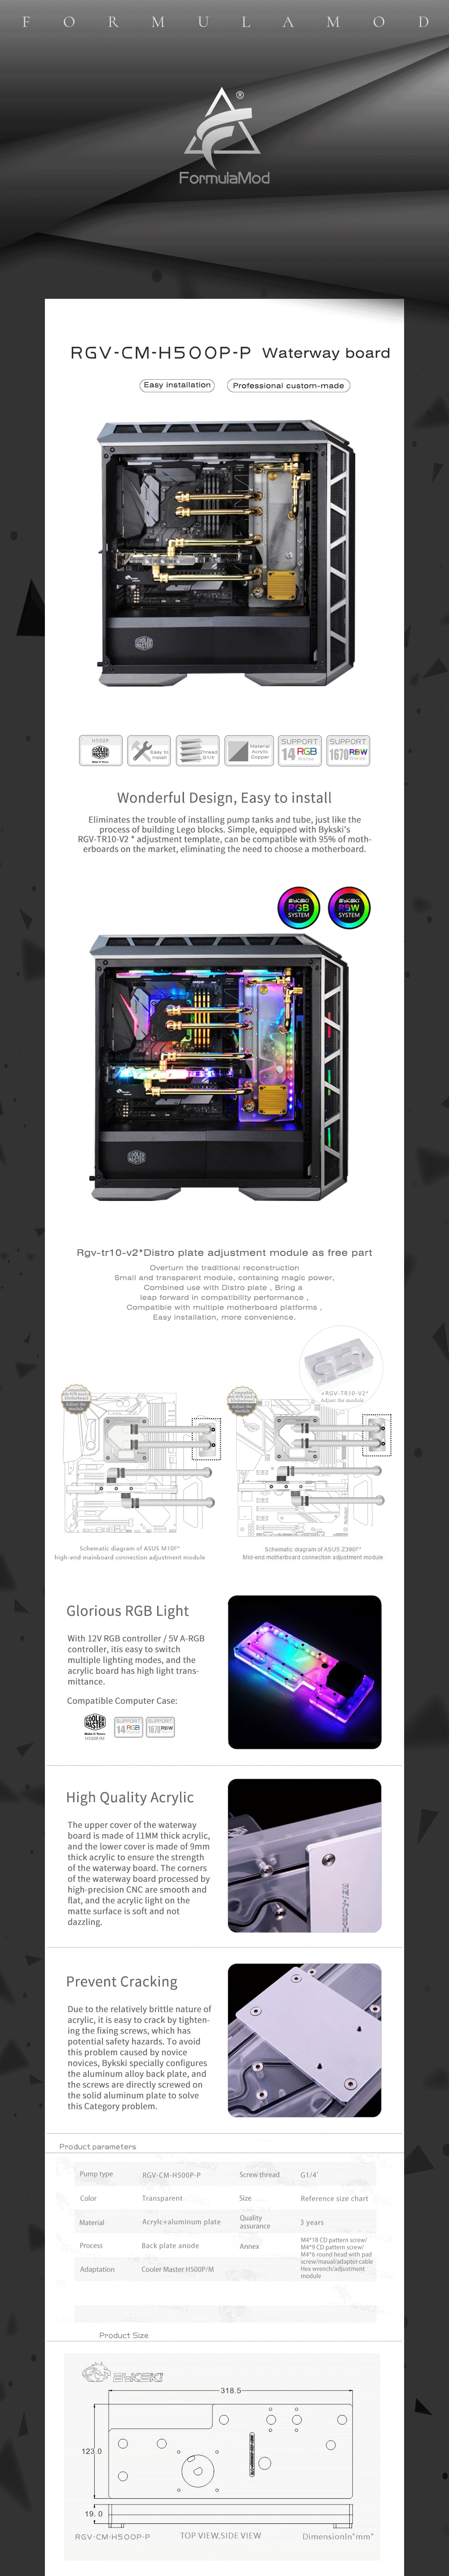 Bykski RGV-CM-H500, Waterway Boards For CoolerMaster H500P/H500M Case, For Intel CPU Water Block & Single GPU Building